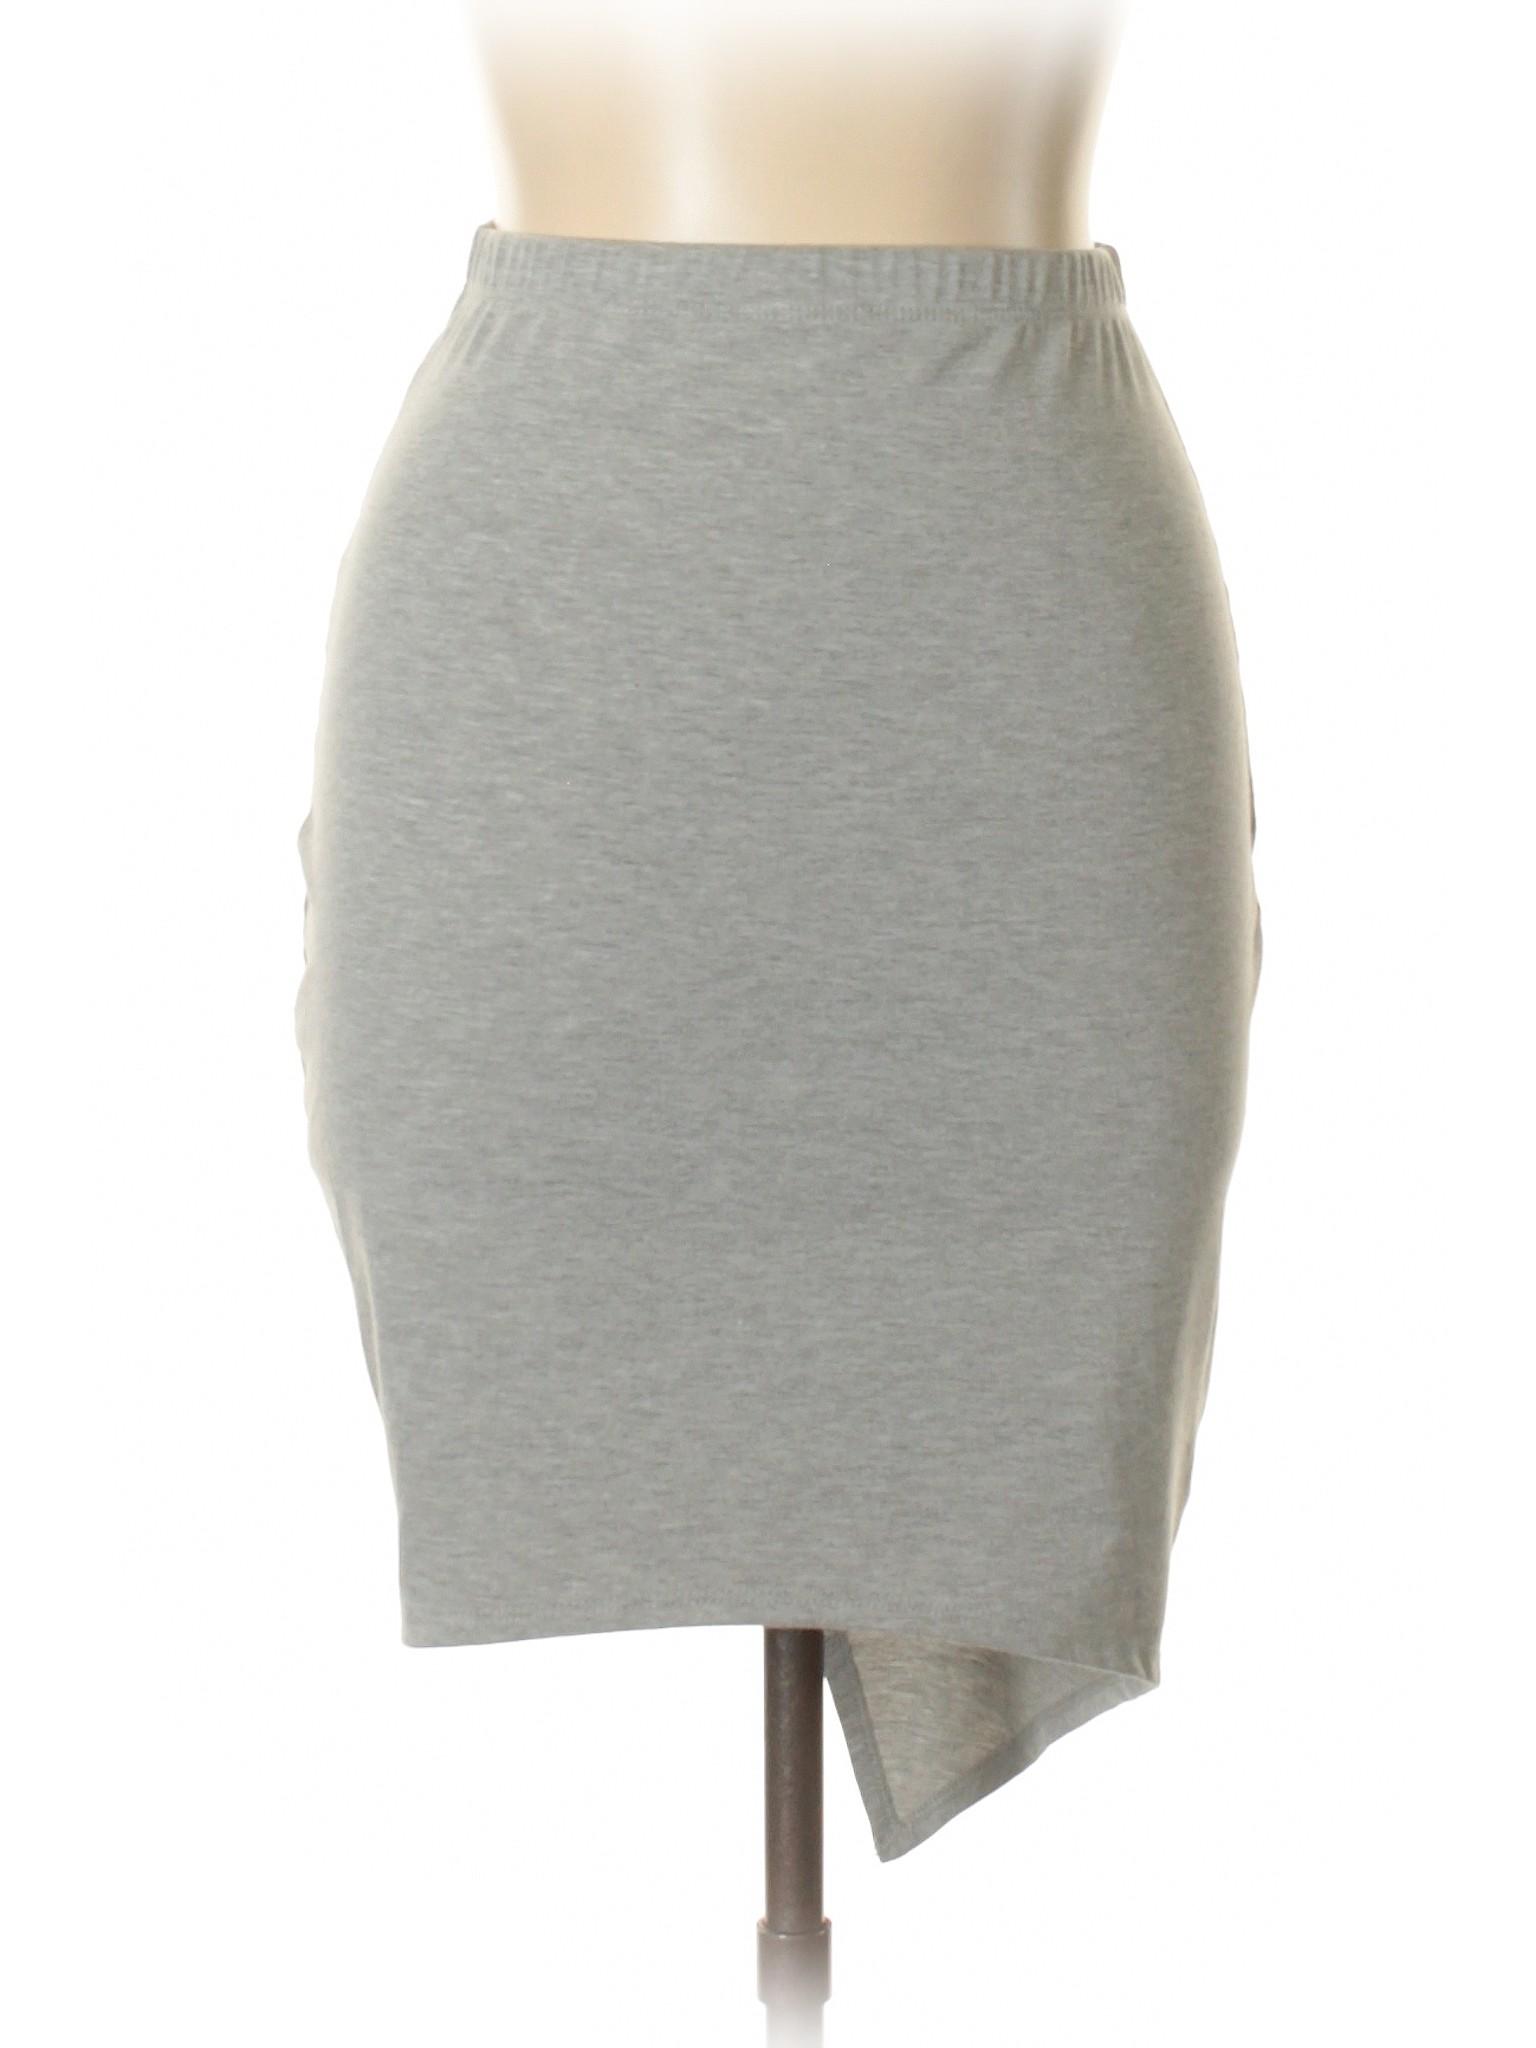 leisure Boutique Solemio Casual leisure Solemio Solemio Boutique Skirt Boutique leisure Casual Skirt tx75f